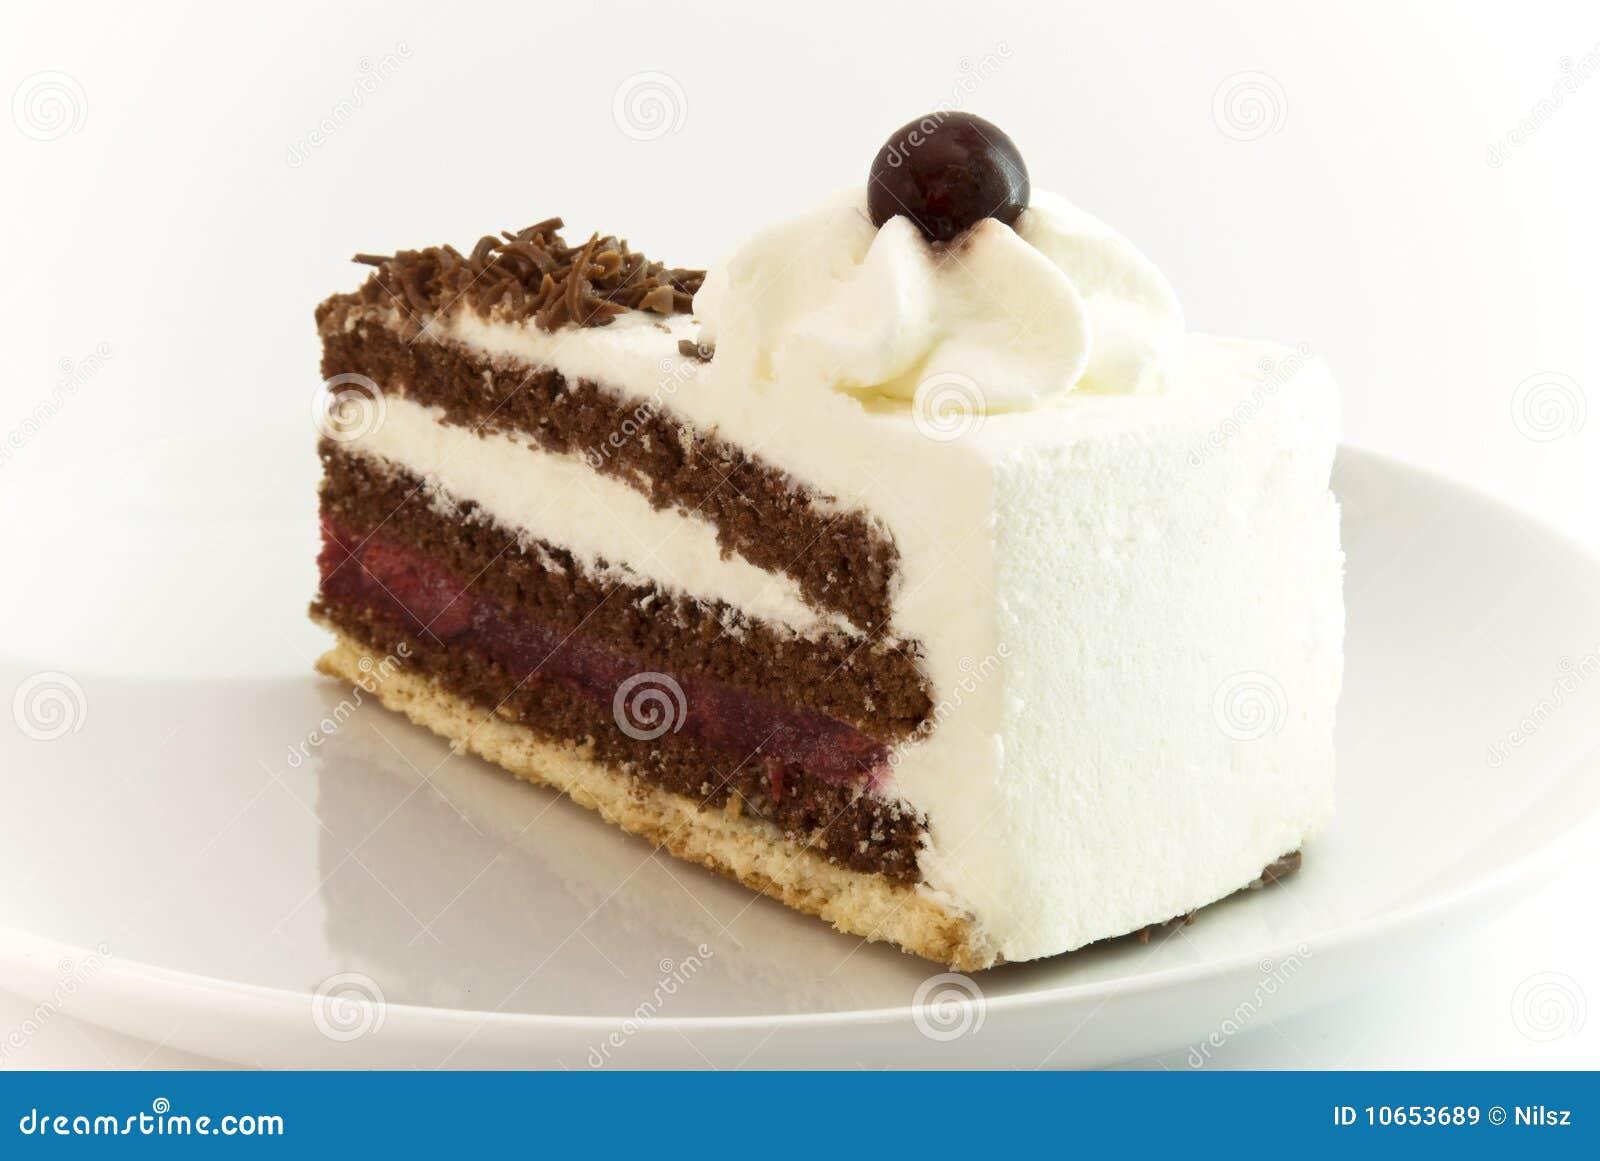 Community Bakery Cake Prices